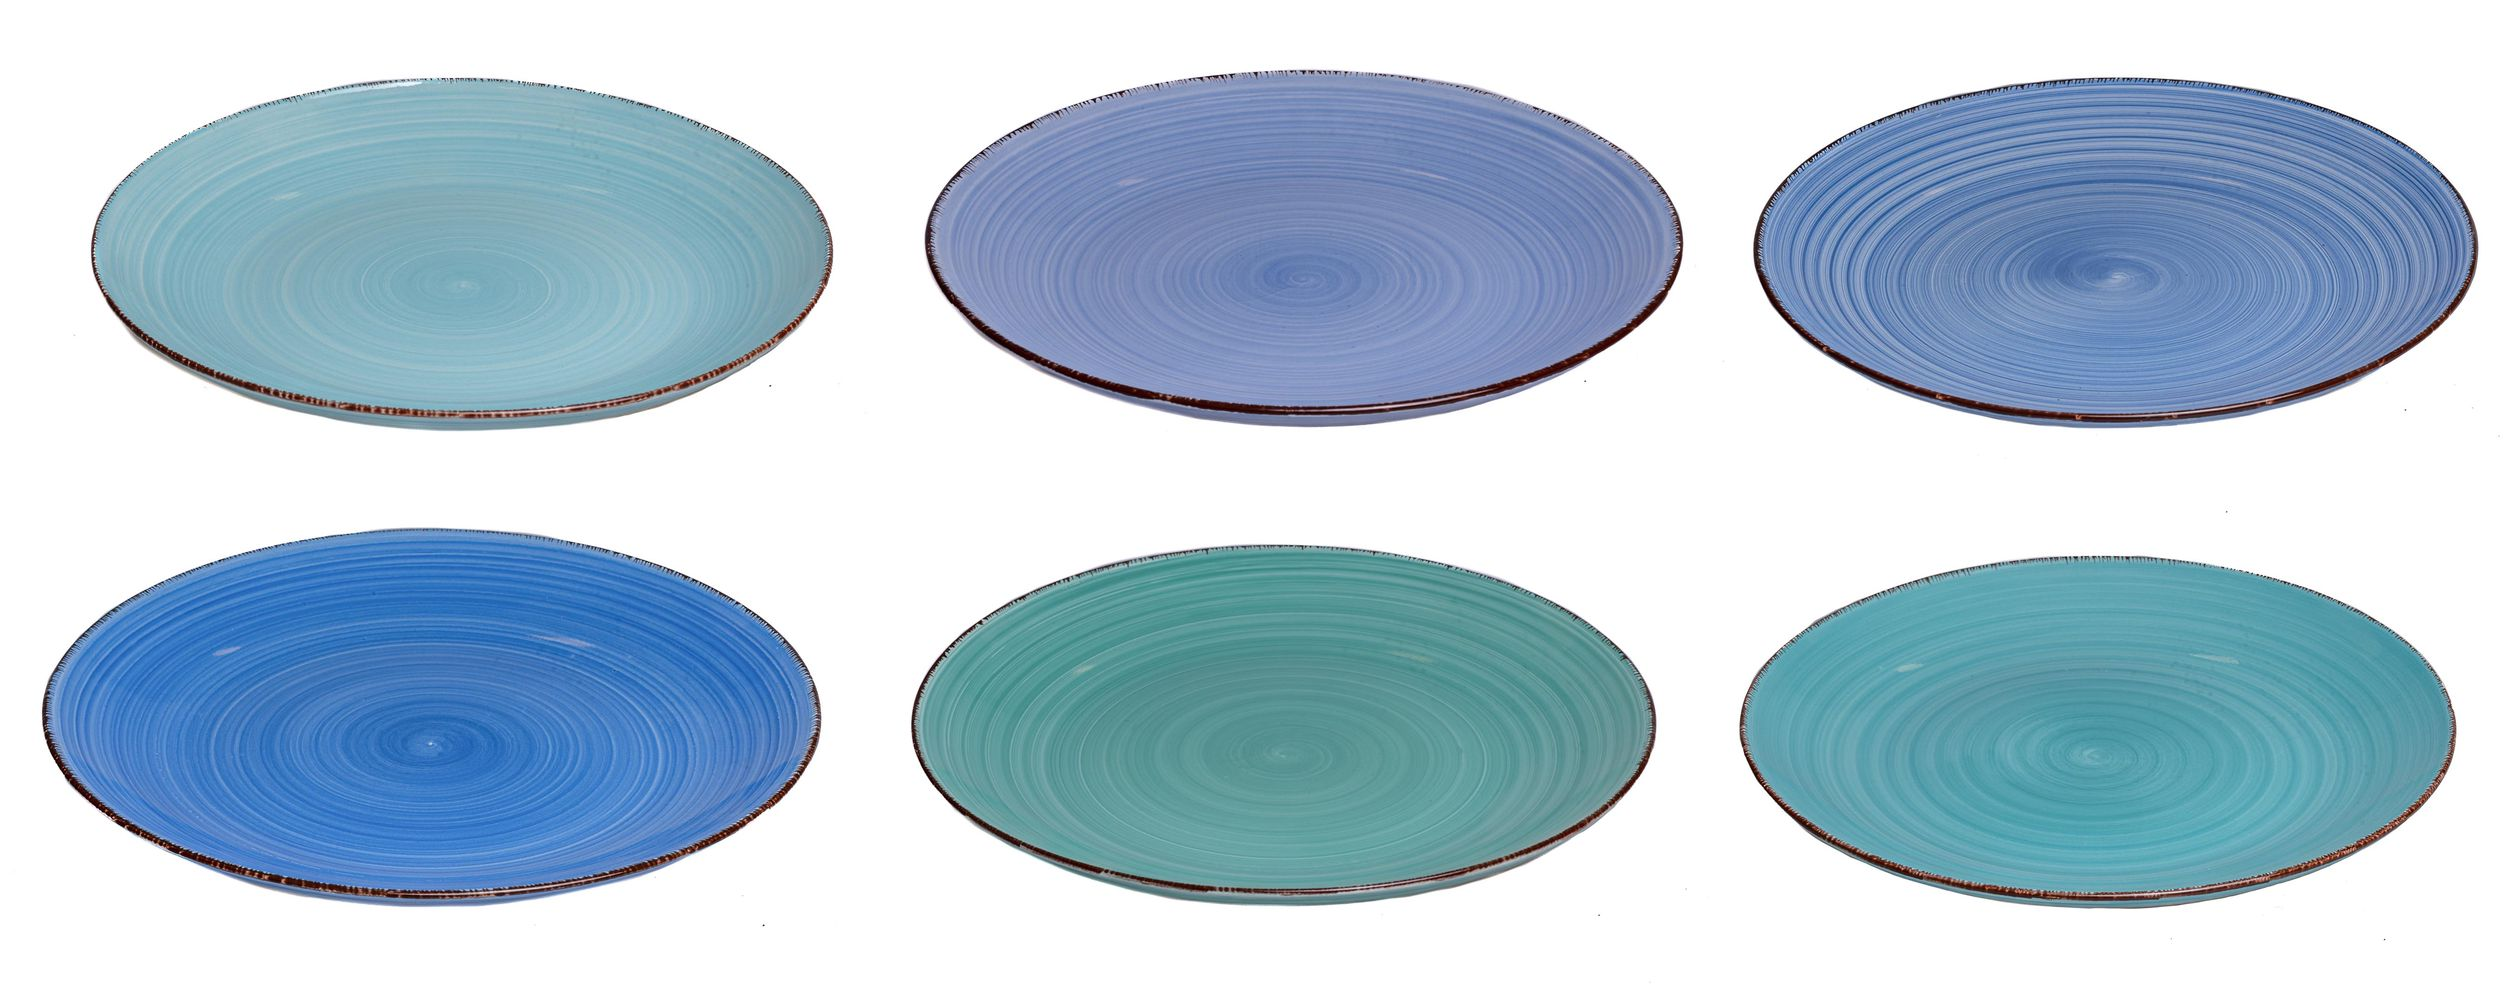 Studio Tavola Dinner Plates Ocean Blue 27 Cm 6 Free Shipping From 99 On Cookinglife Eu